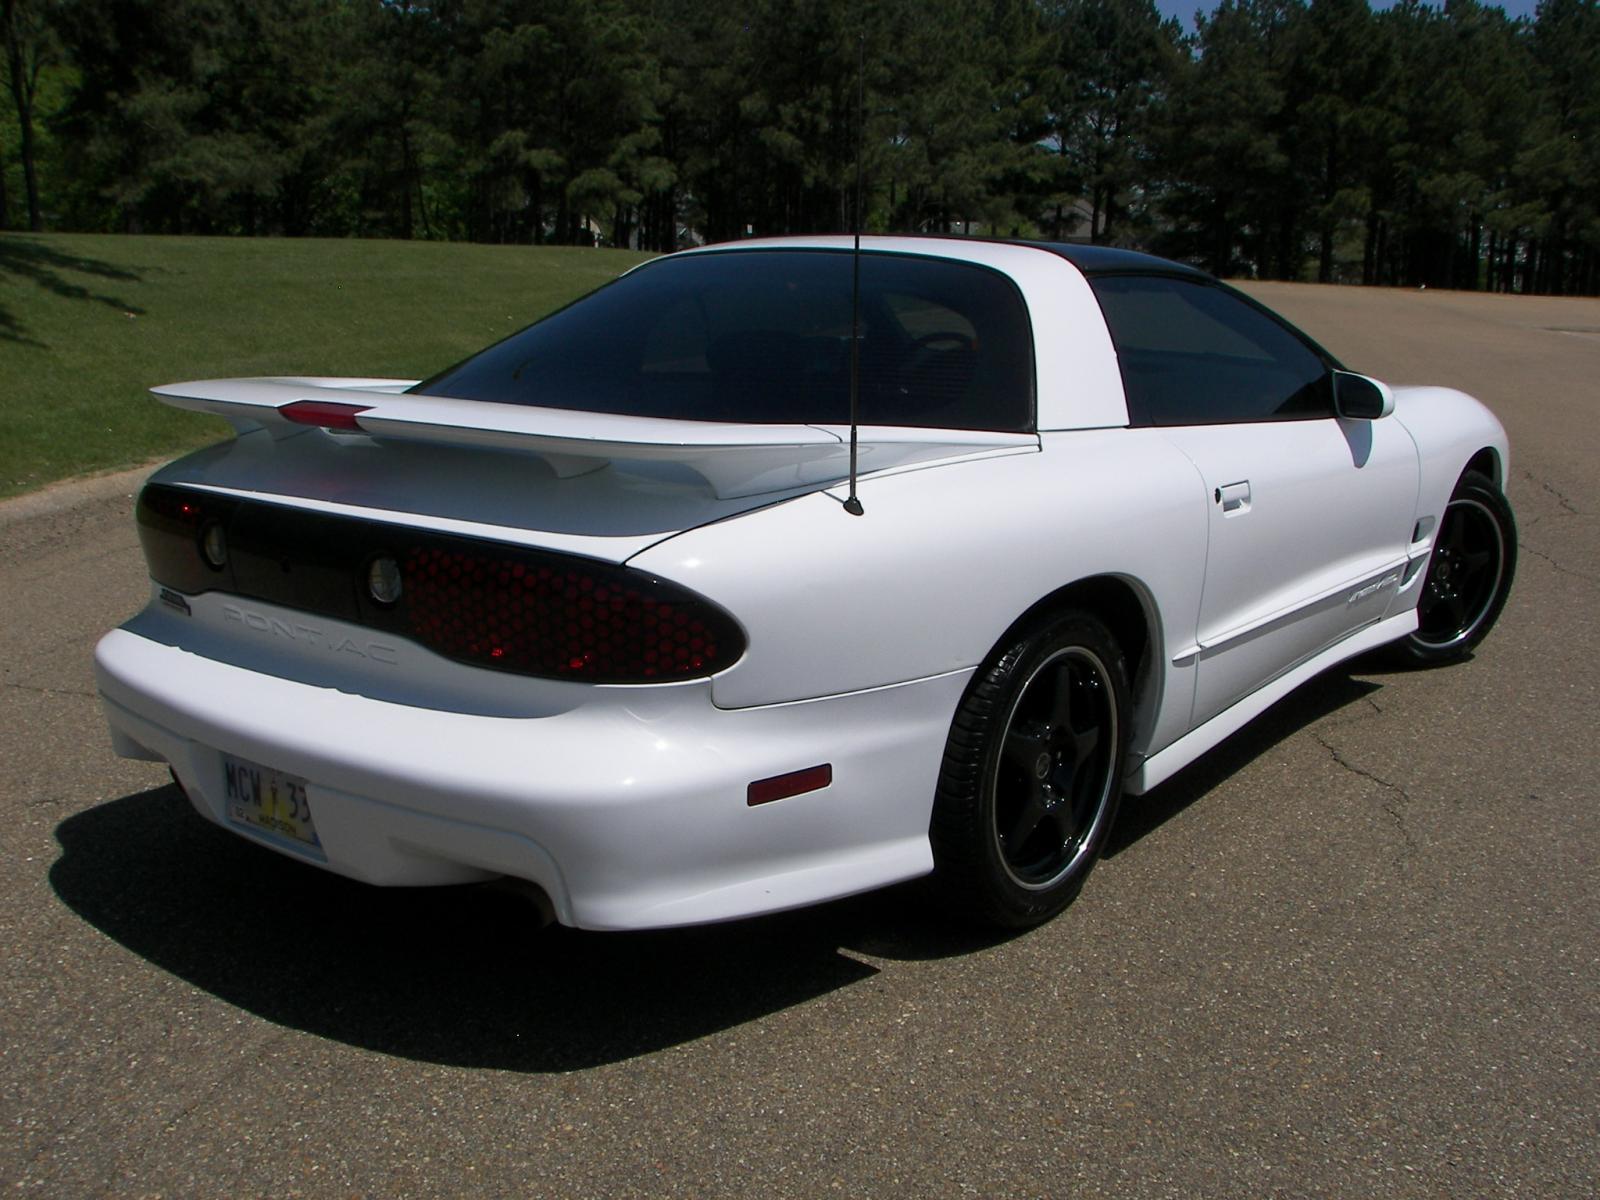 Pontiac Trans Am Related Imagesstart 150 Weili Automotive Network 1998 Specs Sale Trade 7 000